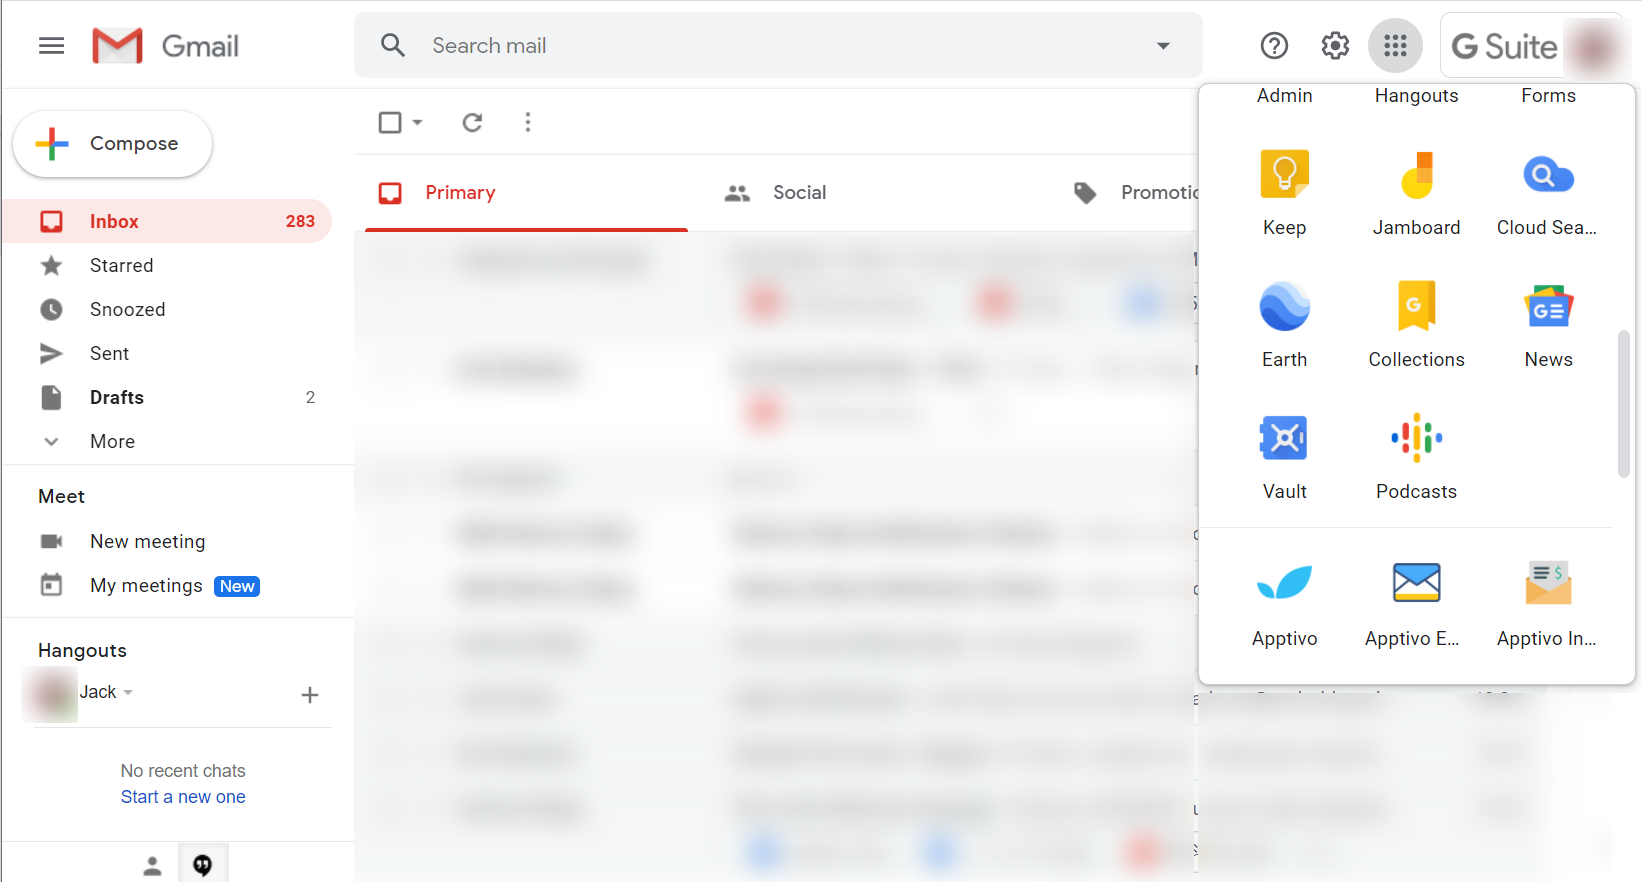 Apptivo Emails